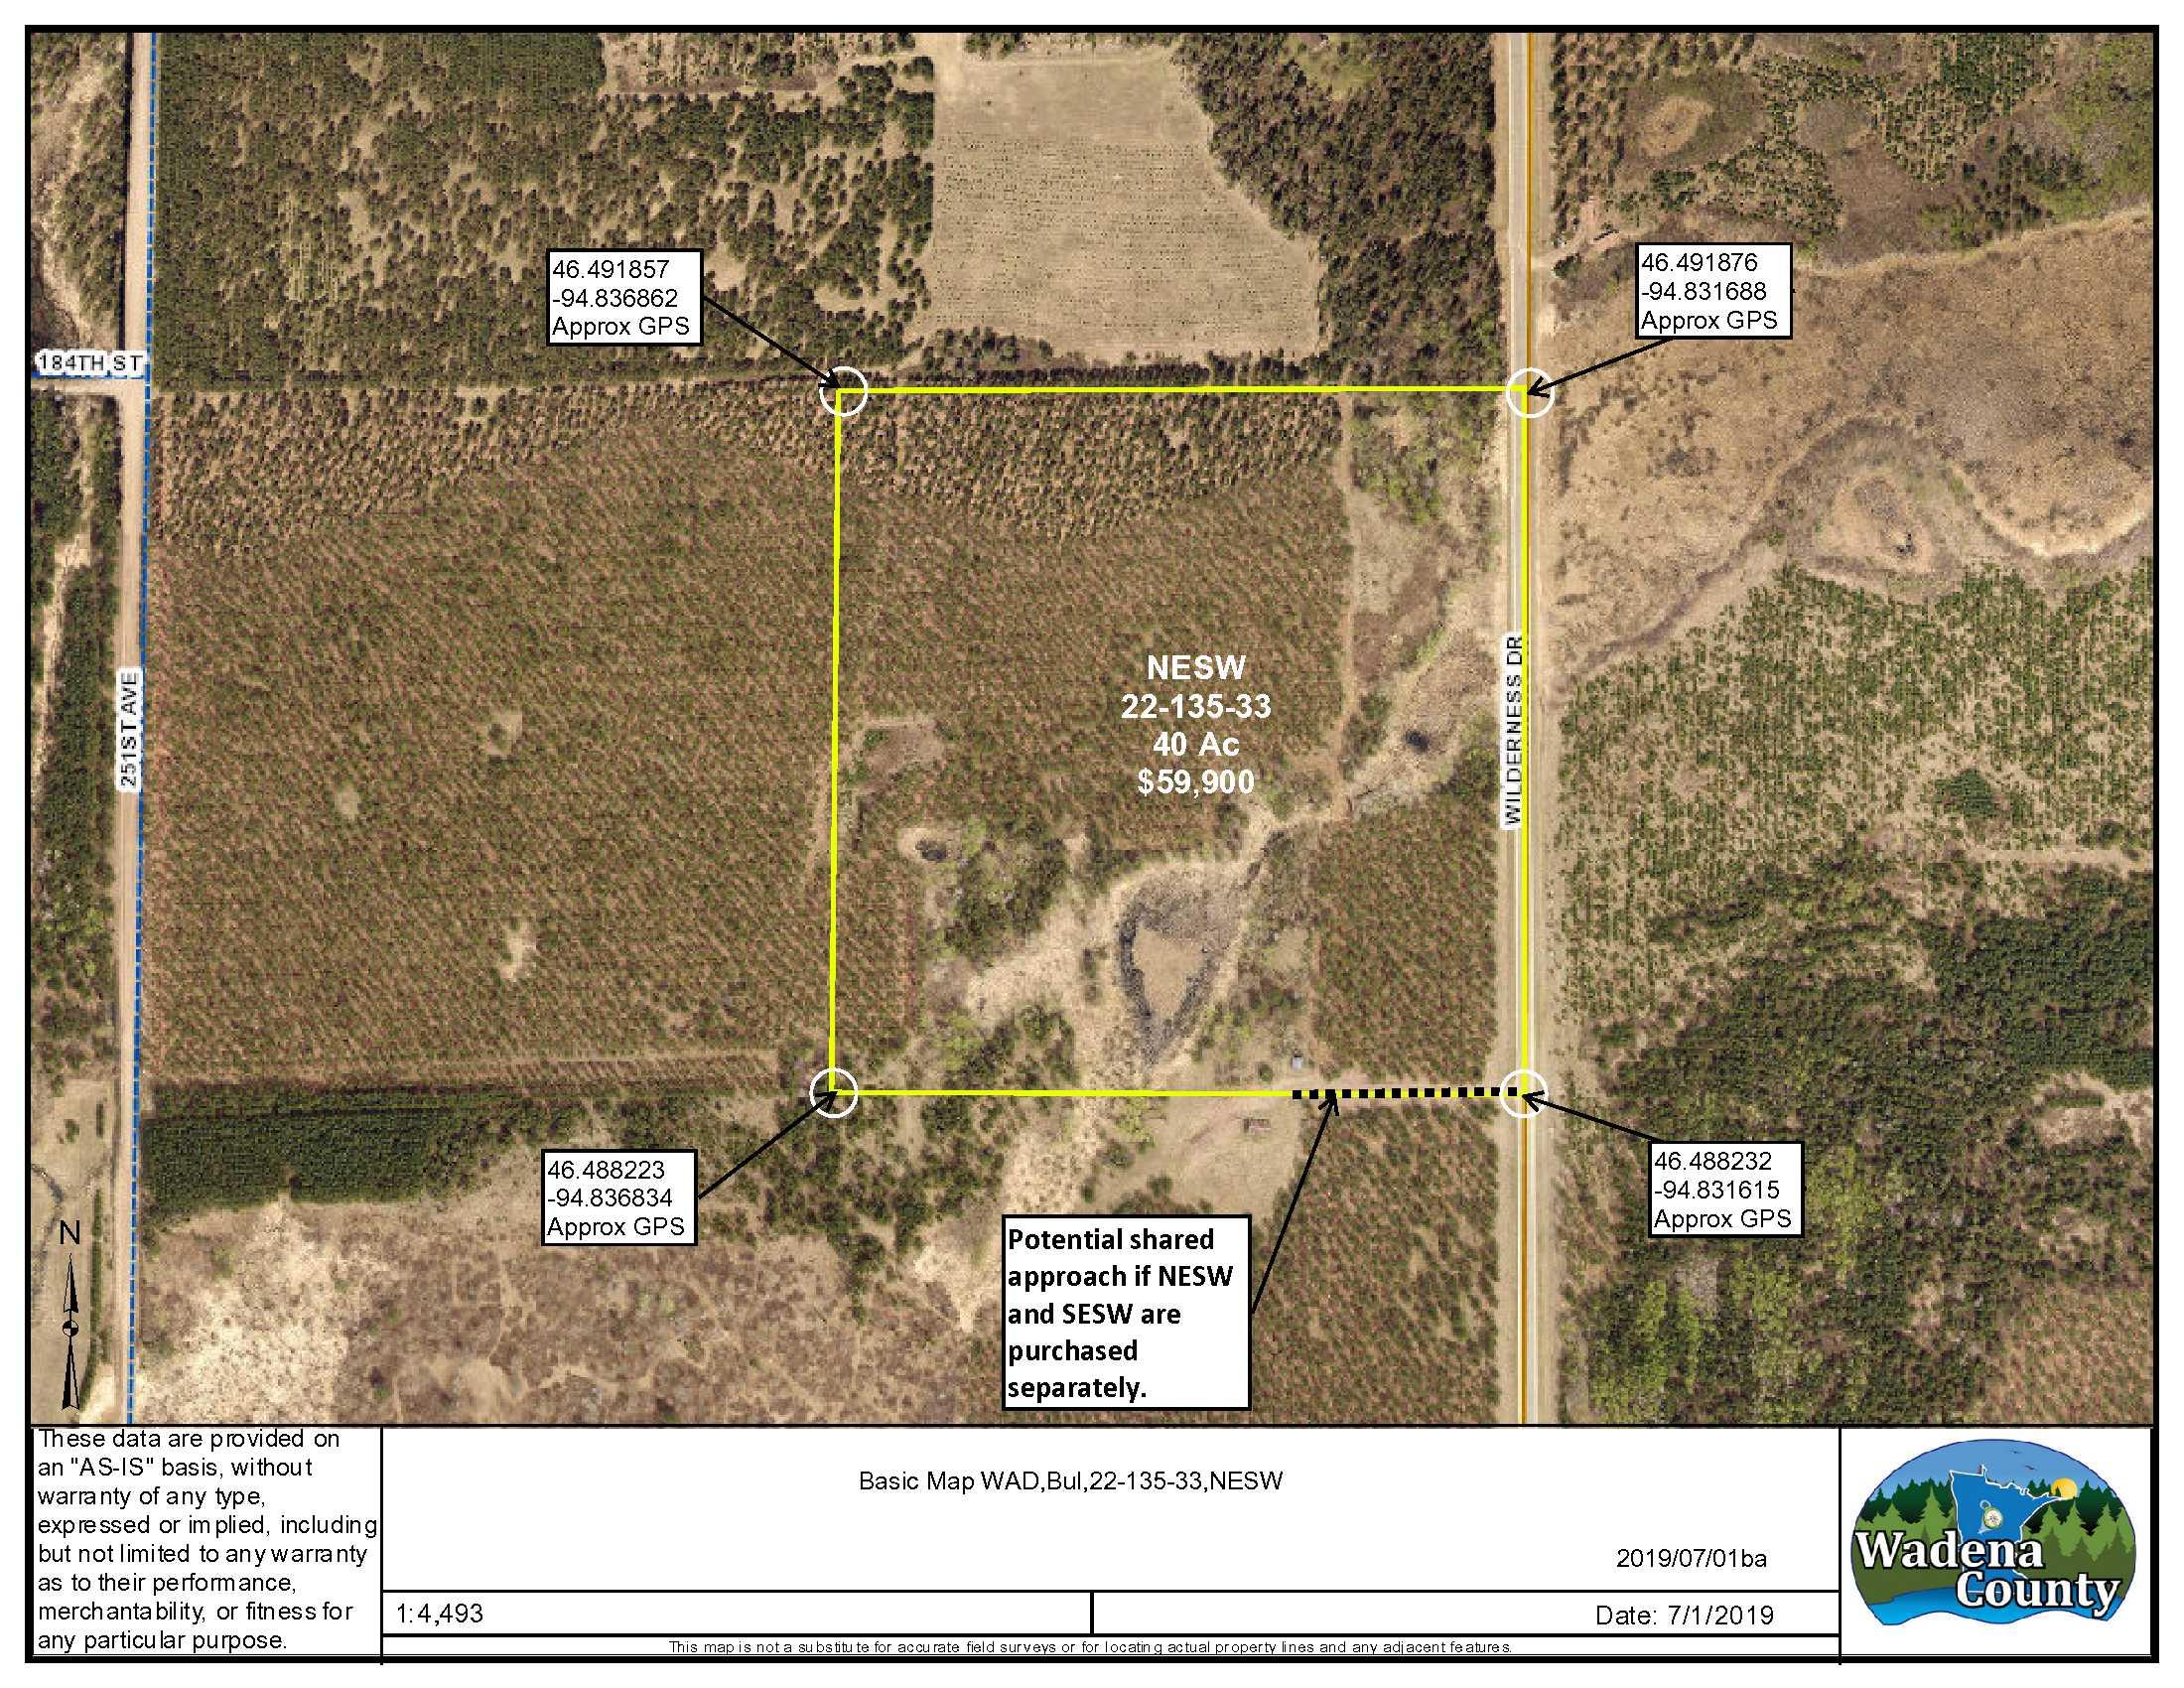 NESW Wilderness Dr., Bullard Twp., Staples, Wadena County